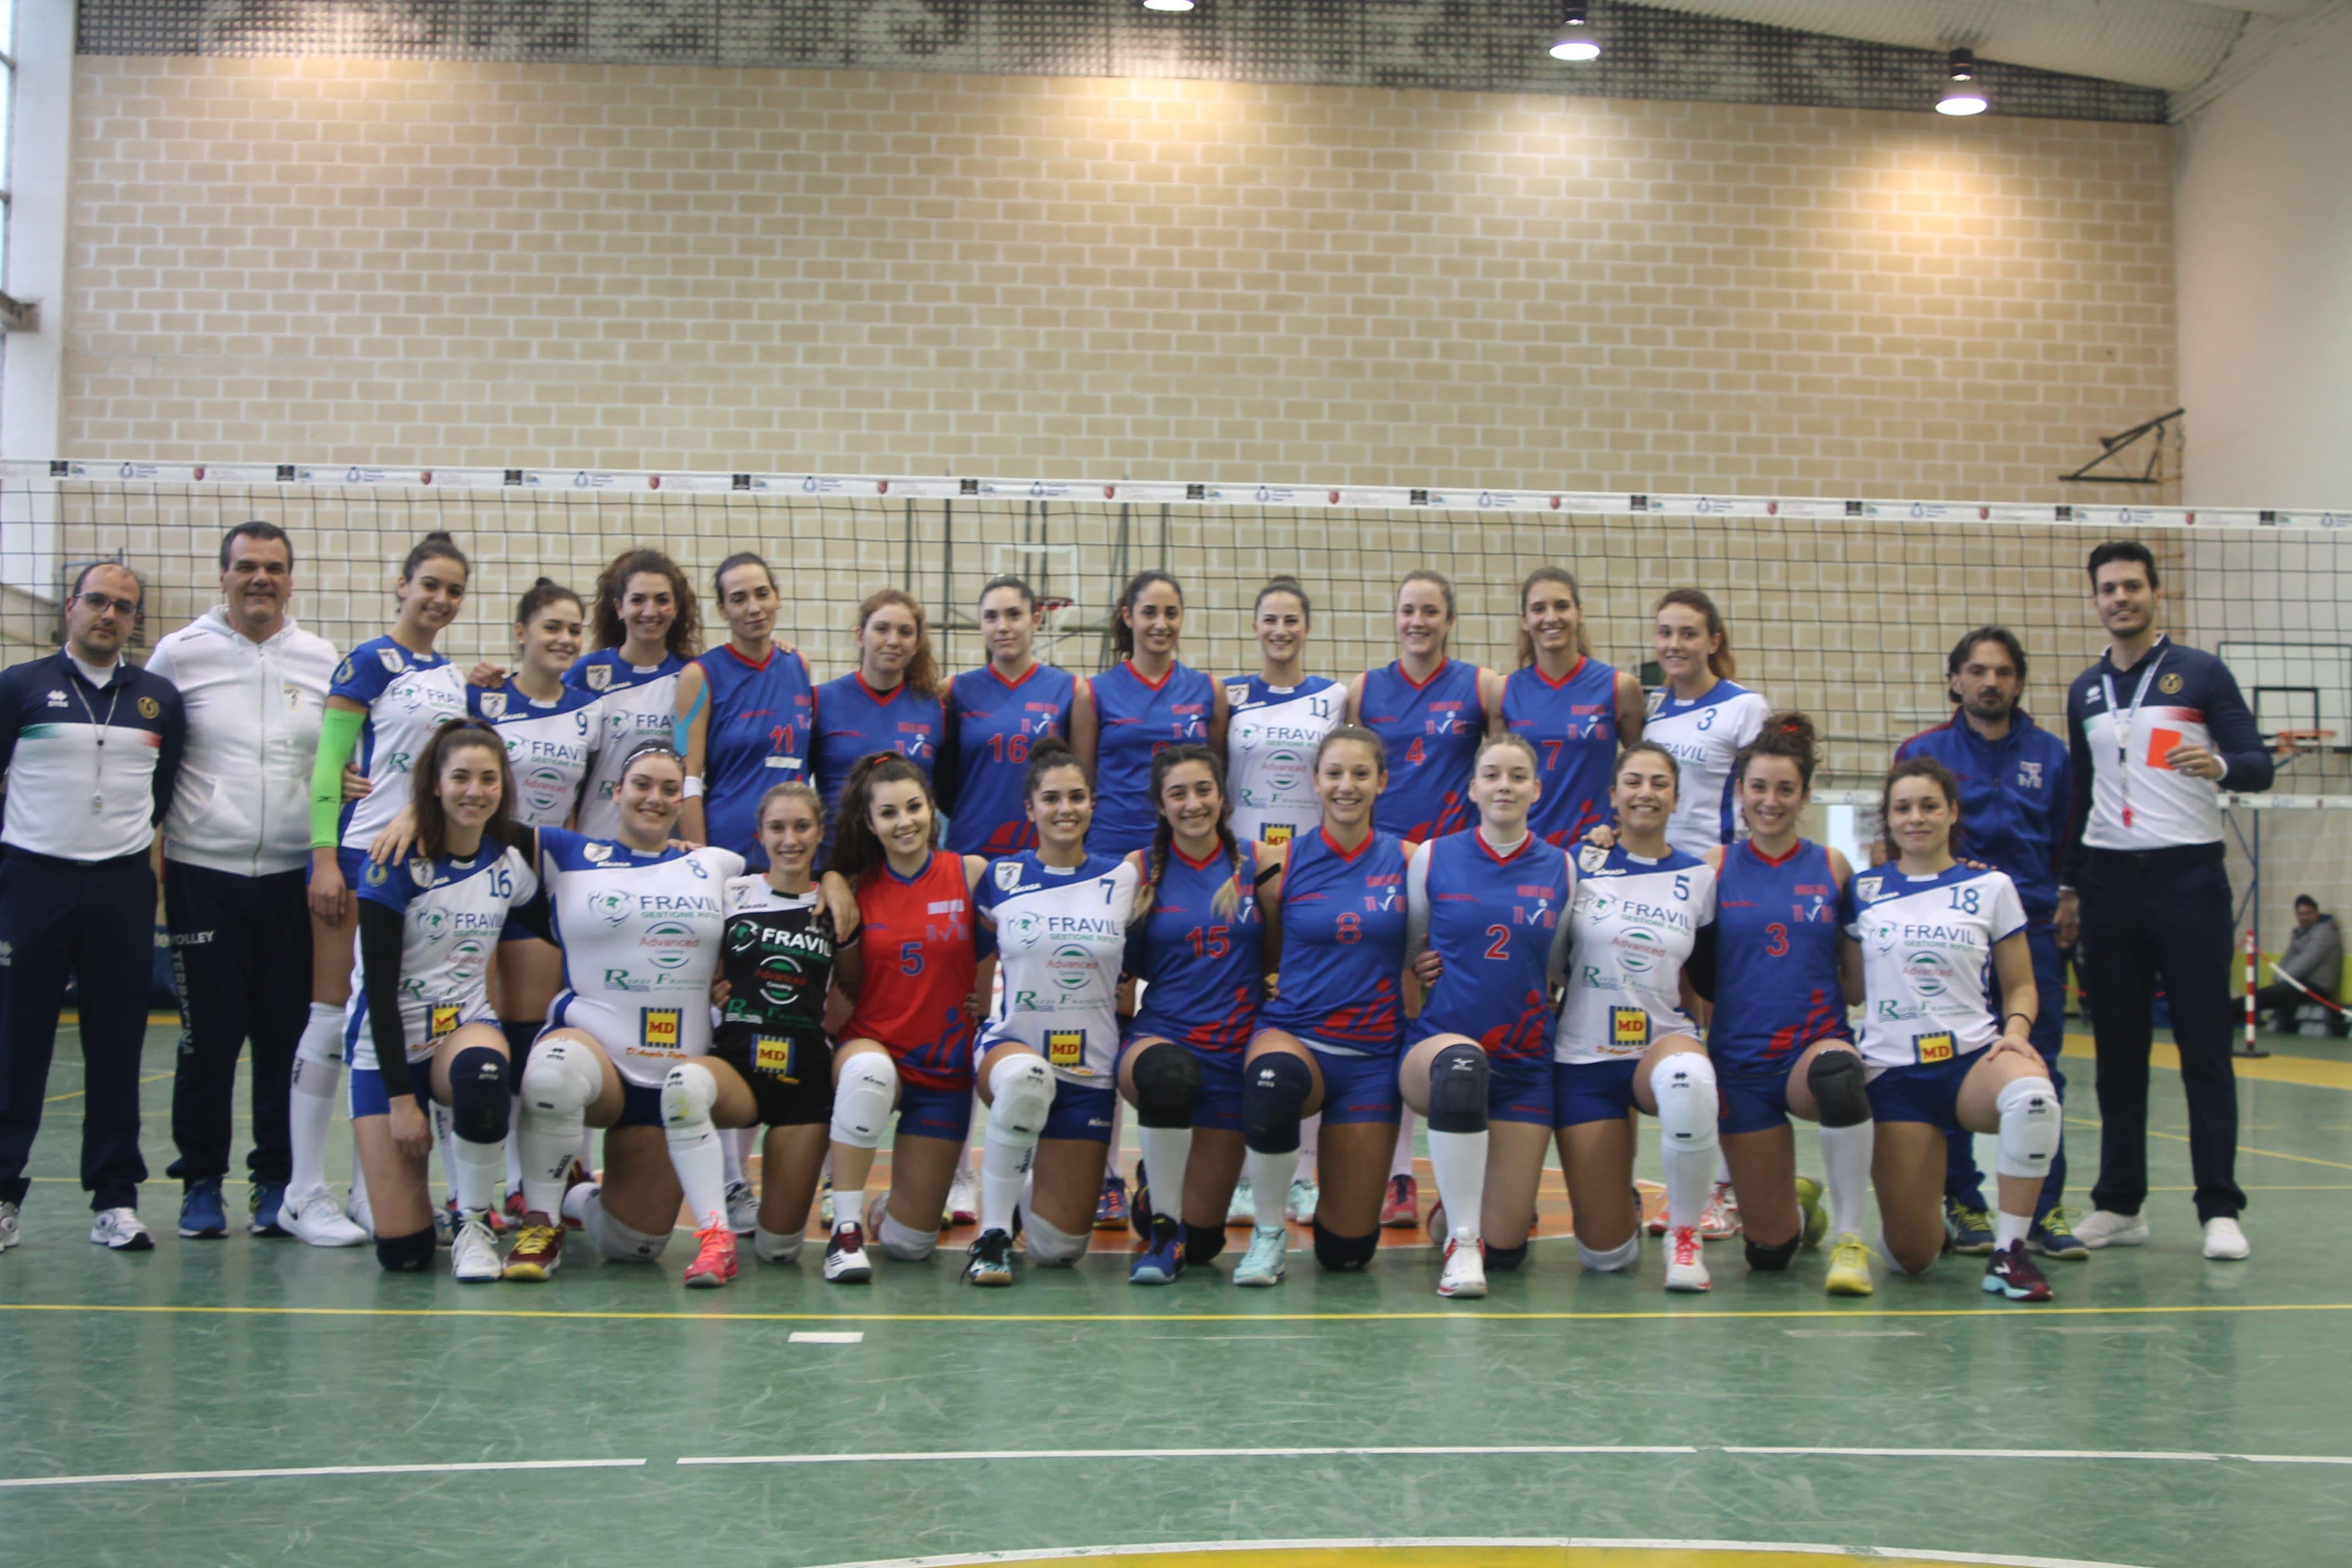 serie-b2-sconfitta-a-tivoli-per-la-volley-terracina